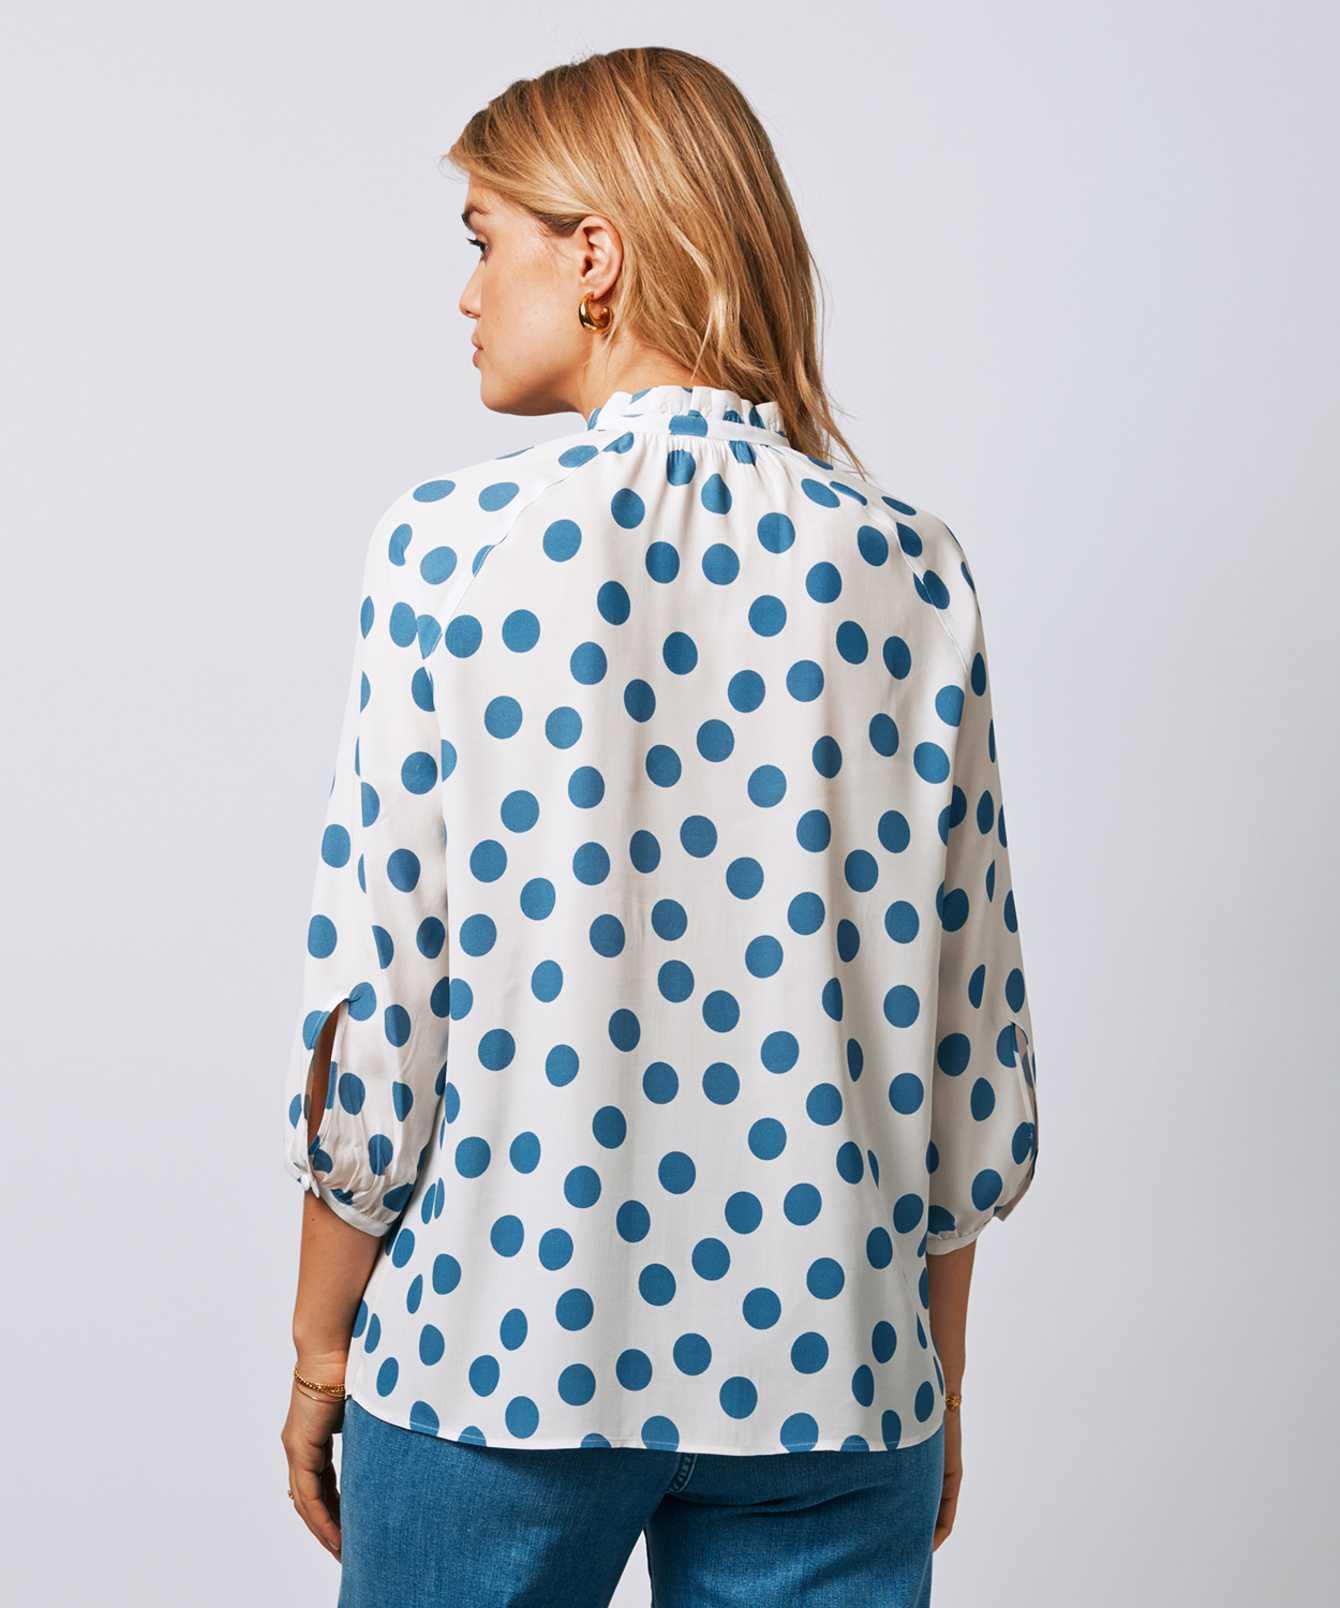 Shirt Mary Polka  The Shirt Factory